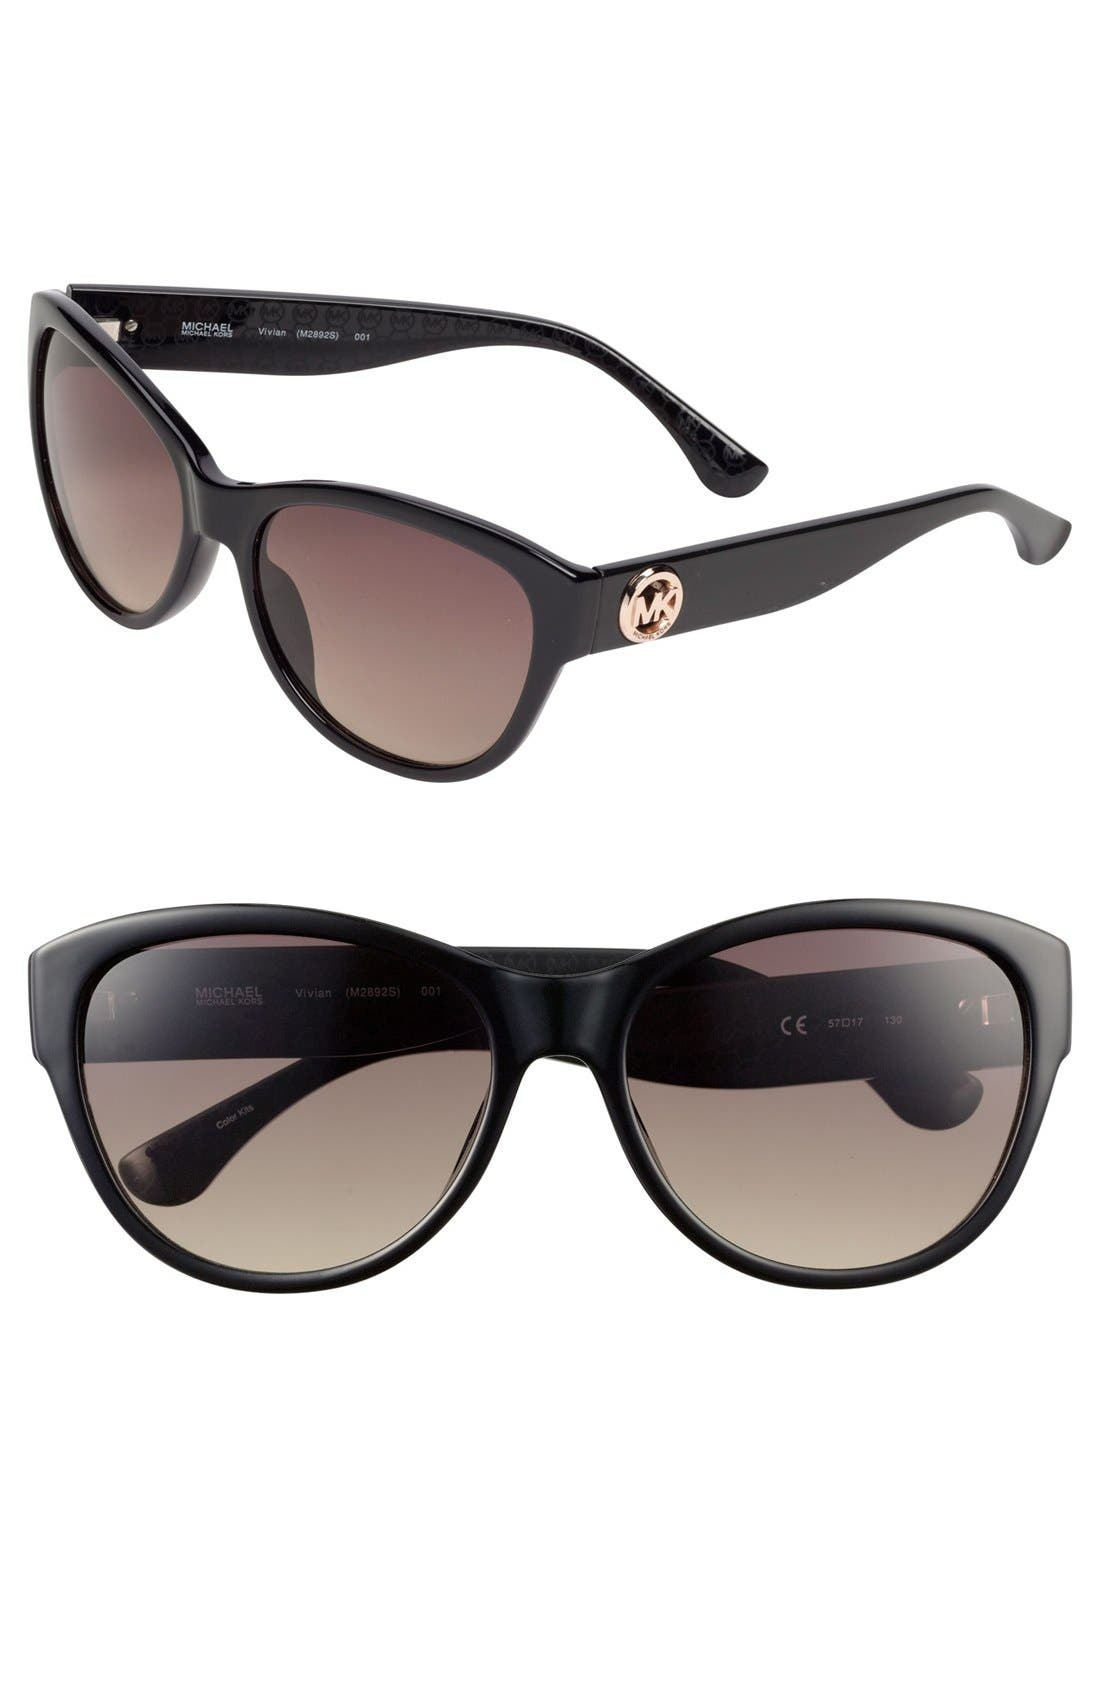 MICHAEL MICHAEL KORS,                             'Vivian' 57mm Sunglasses,                             Main thumbnail 1, color,                             001